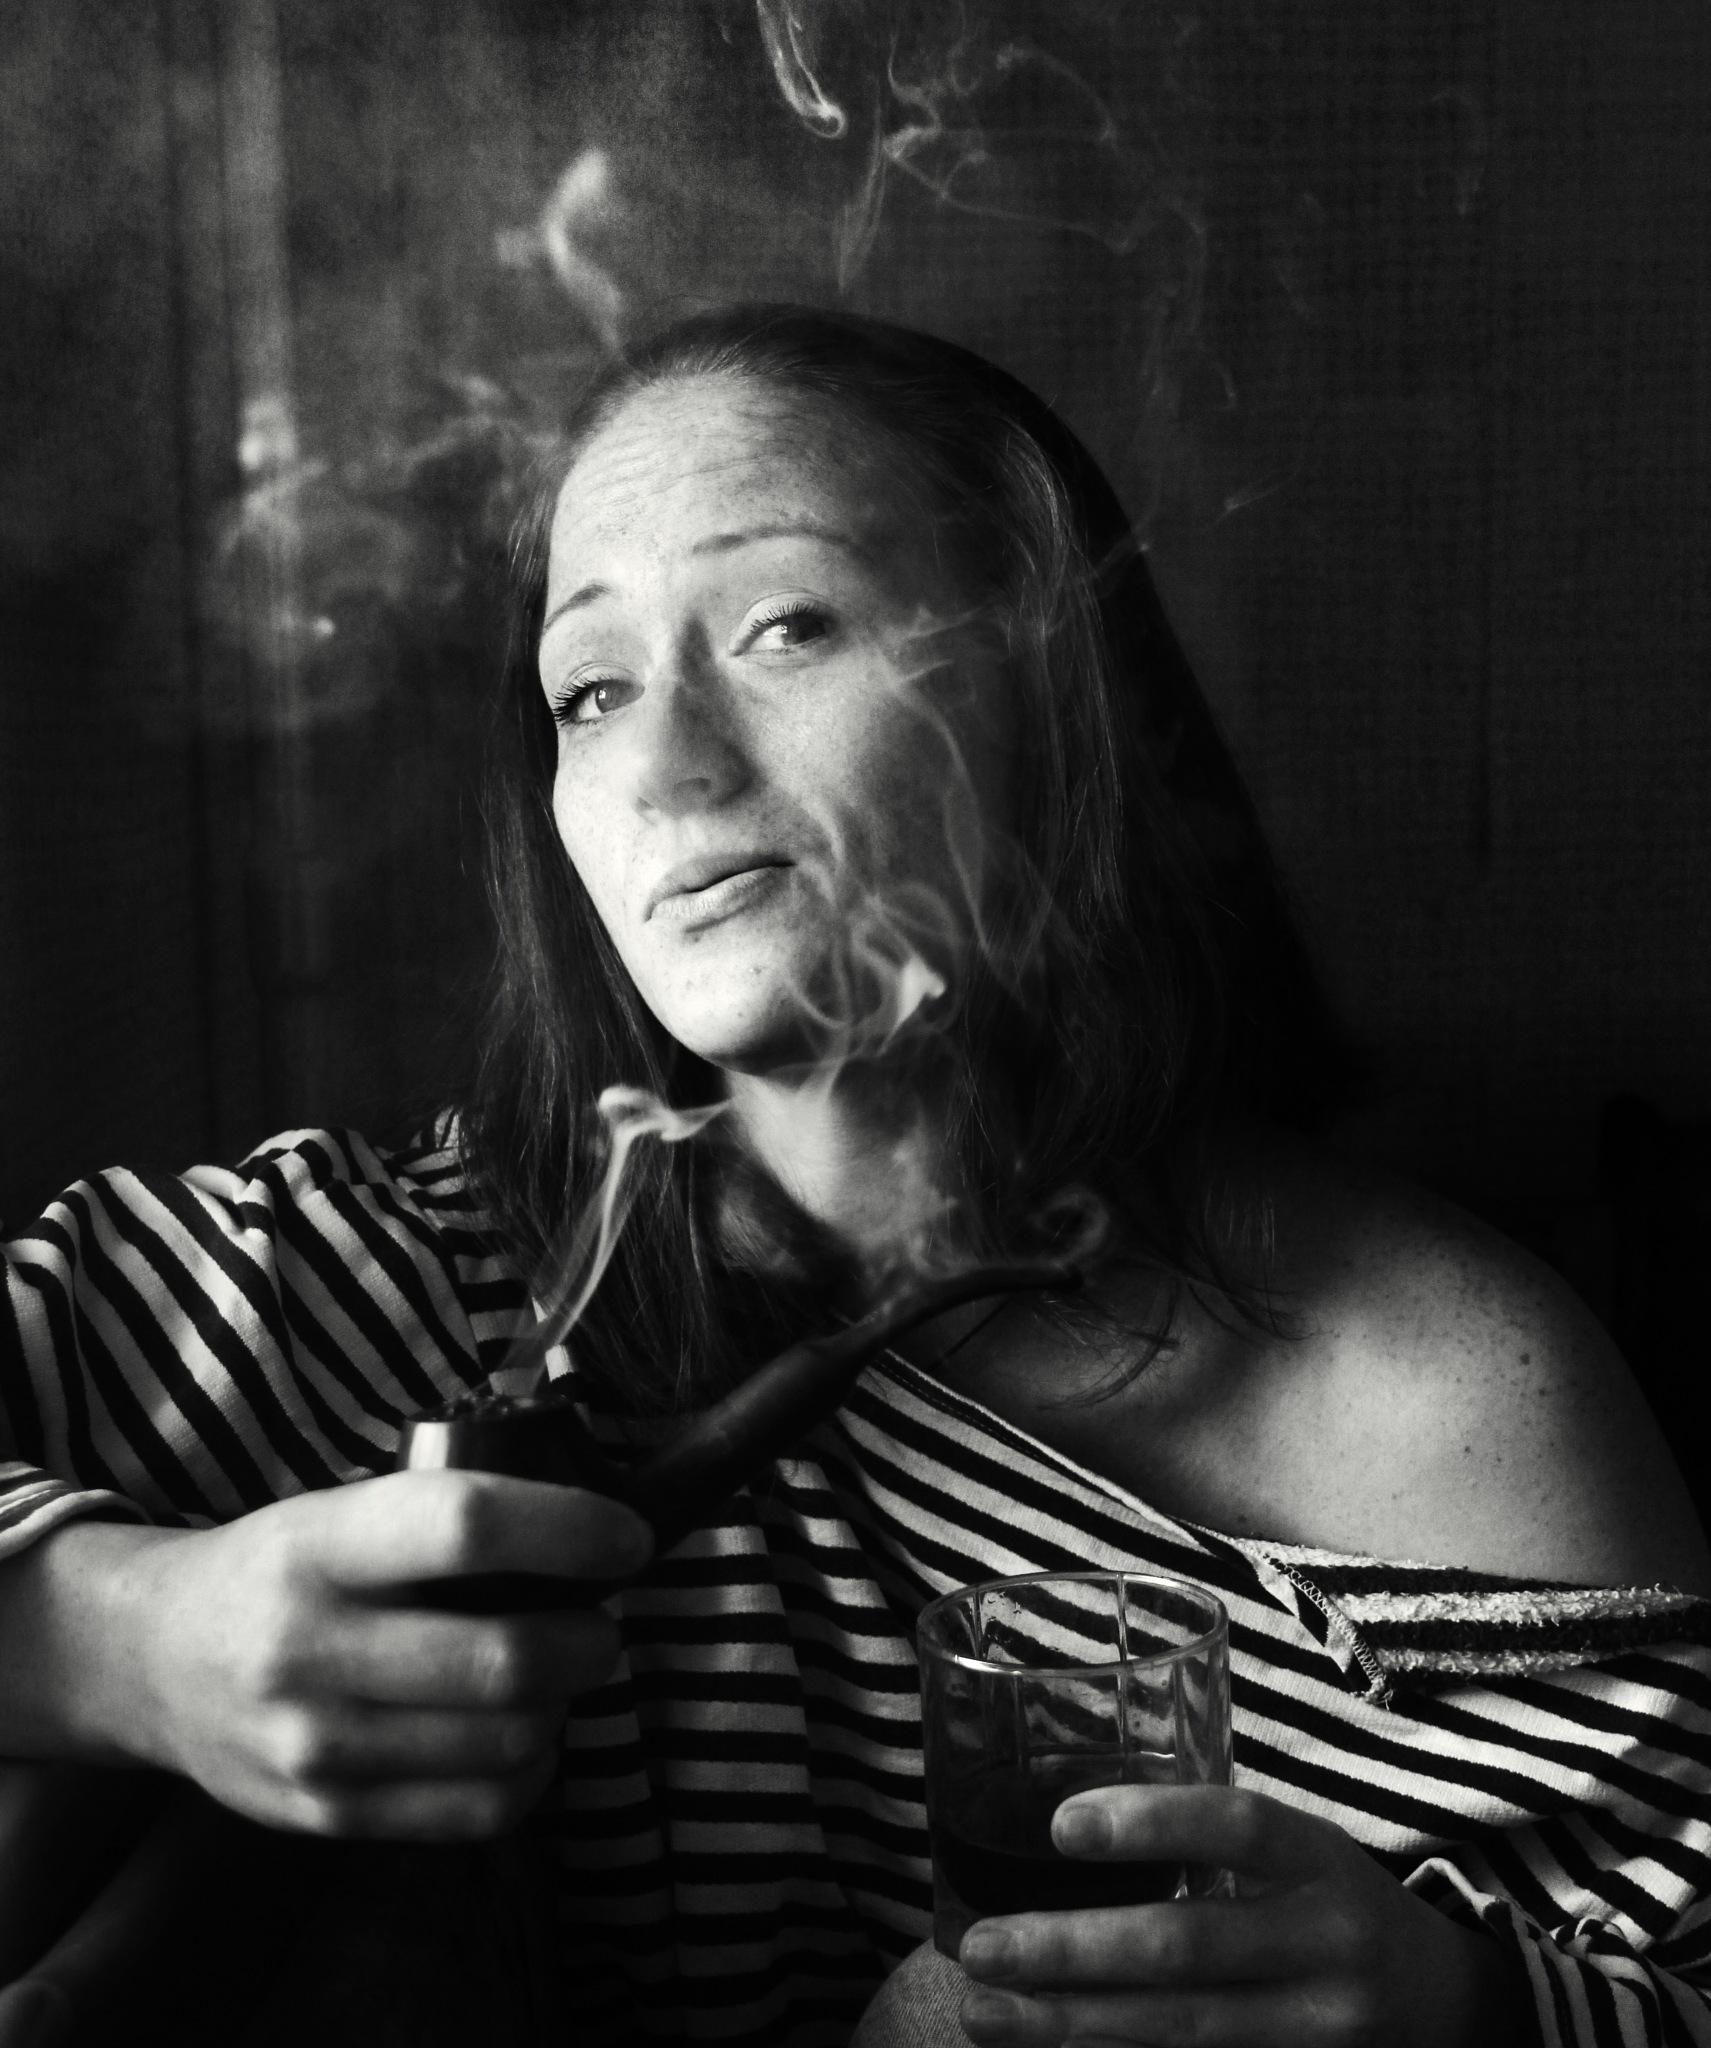 Natalie, pipe fnd a glass of whiskey by Сергей Юрьев